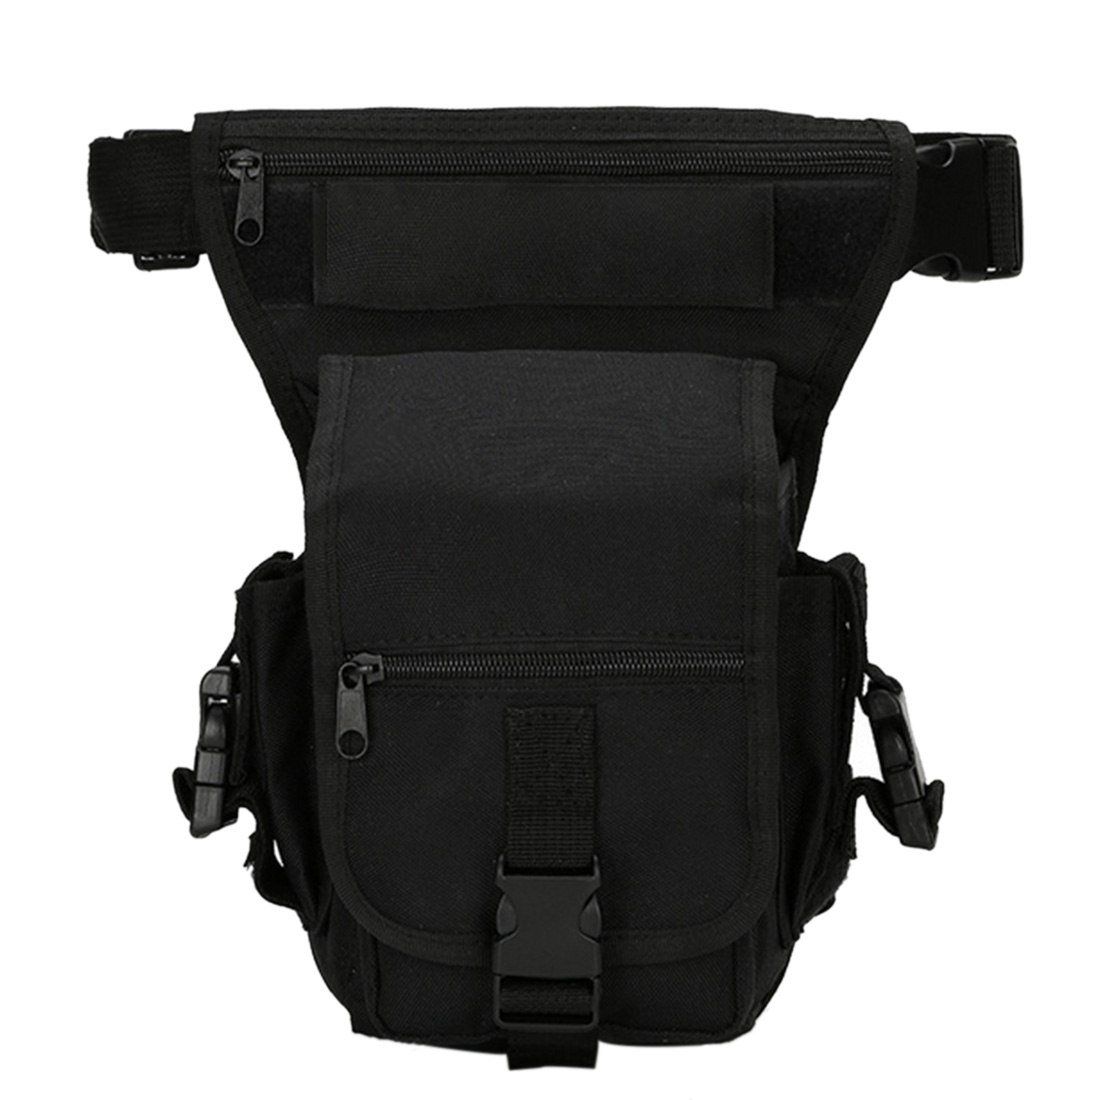 купить Drop Shipping Hot 6 Color Bags Multi-Purpose Detachable Bags Military Drop Leg Waist Bag Thigh Pack Waist Belt Bag For Men Teen недорого